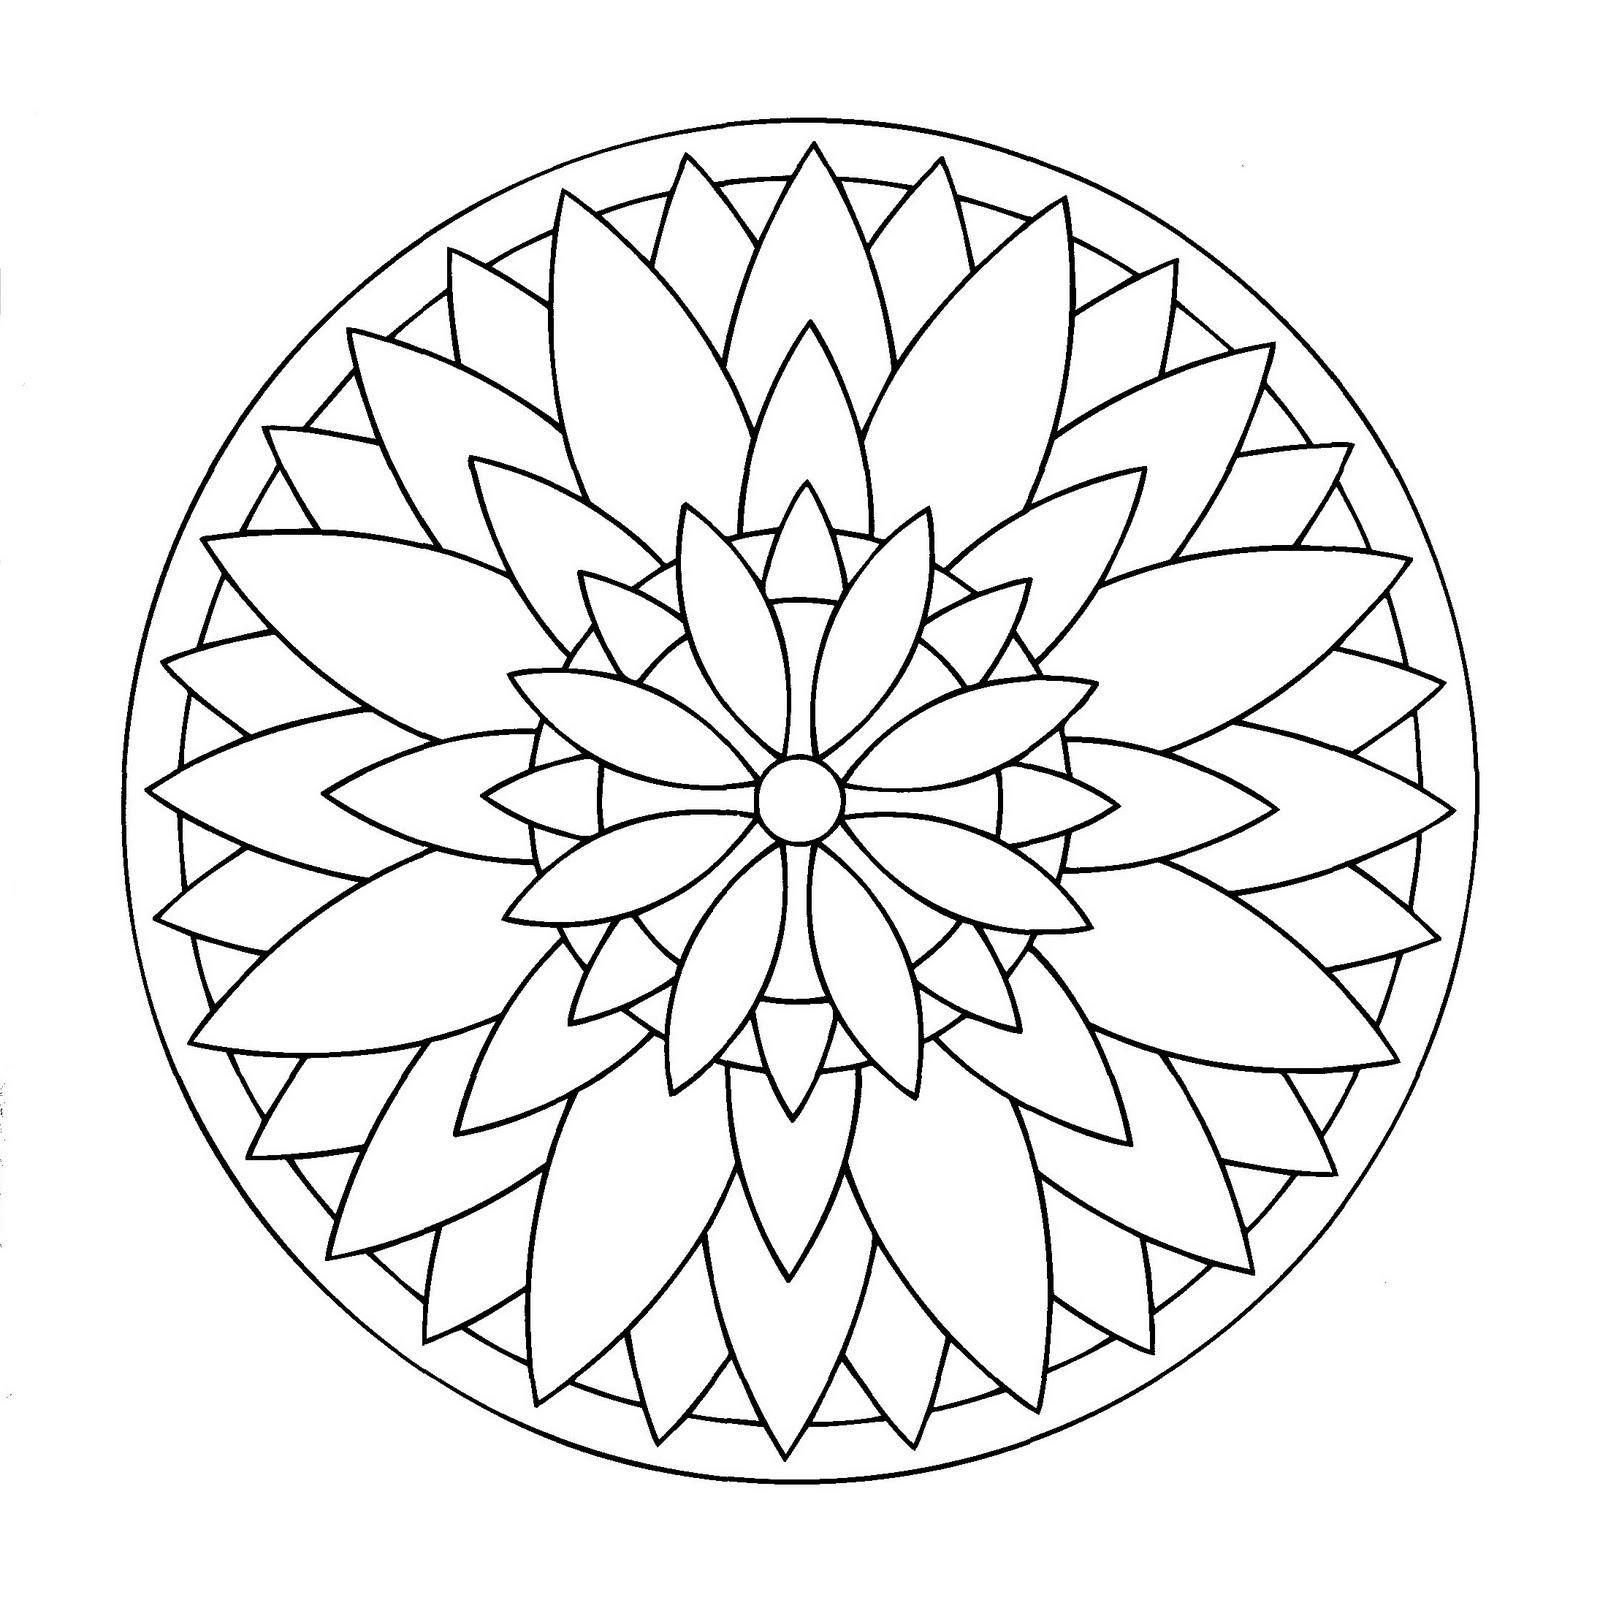 Mandala étoile Mandalas Faciles Pour Enfants 100